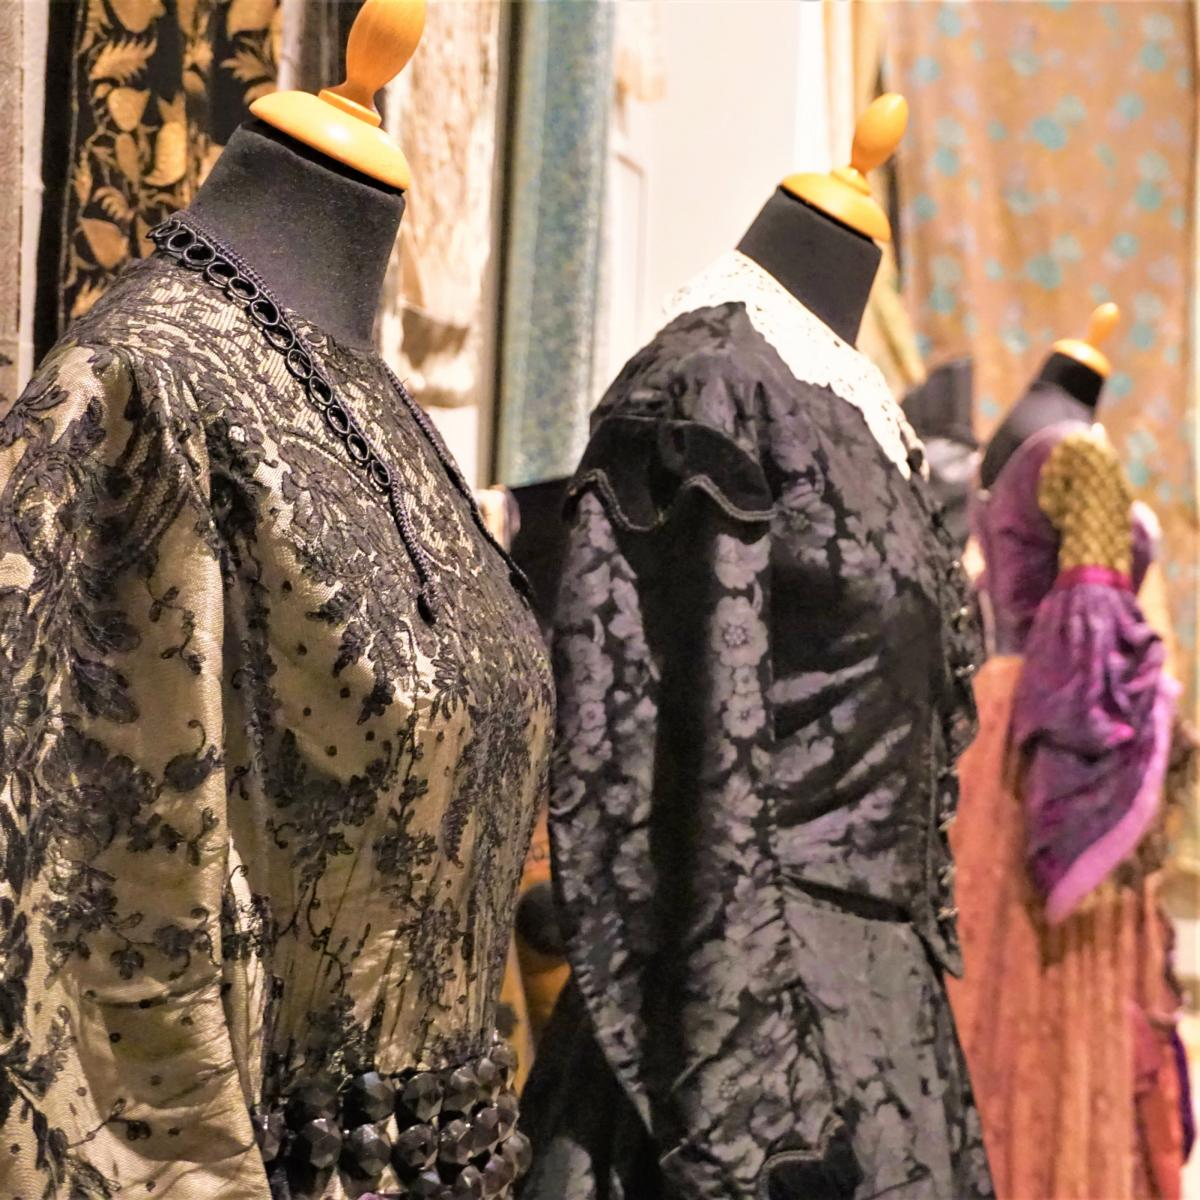 Style Hannover Museum für textile Kunst 1 - Museum für Textile Kunst - Spendenaufruf